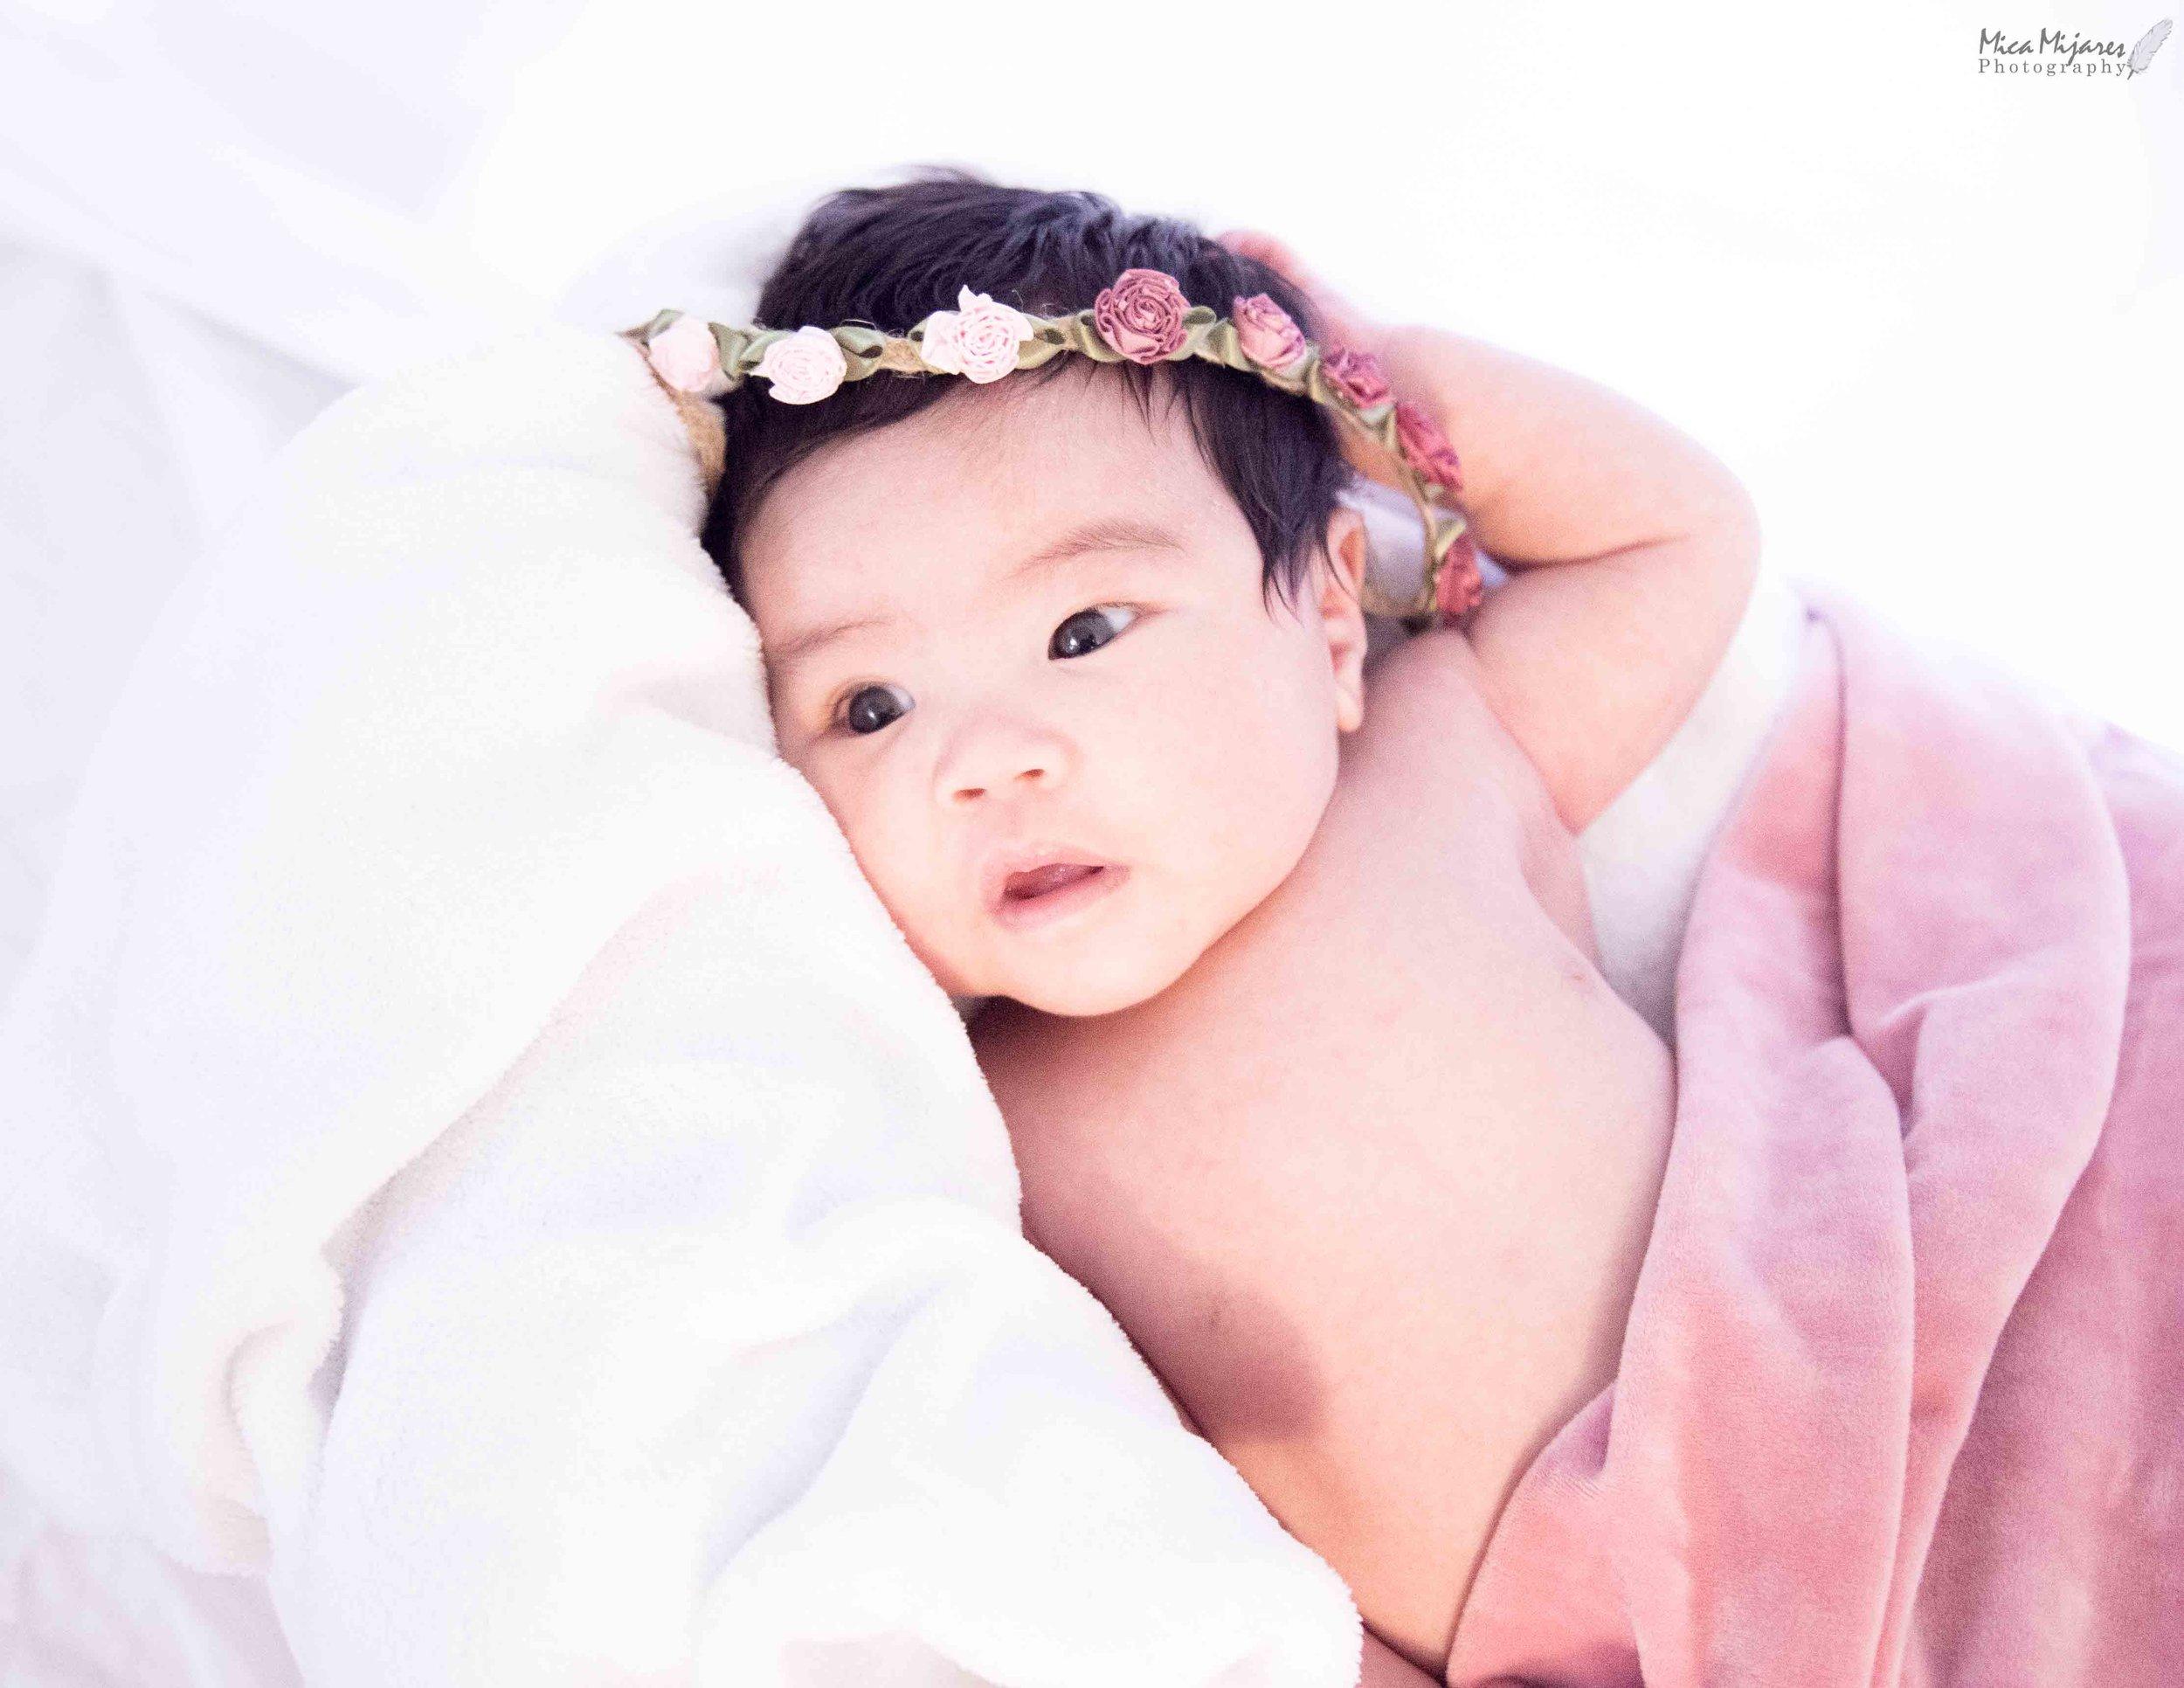 rileyfaith-BabyPhotography-MicaMijaresPhotography (13 of 27).jpg